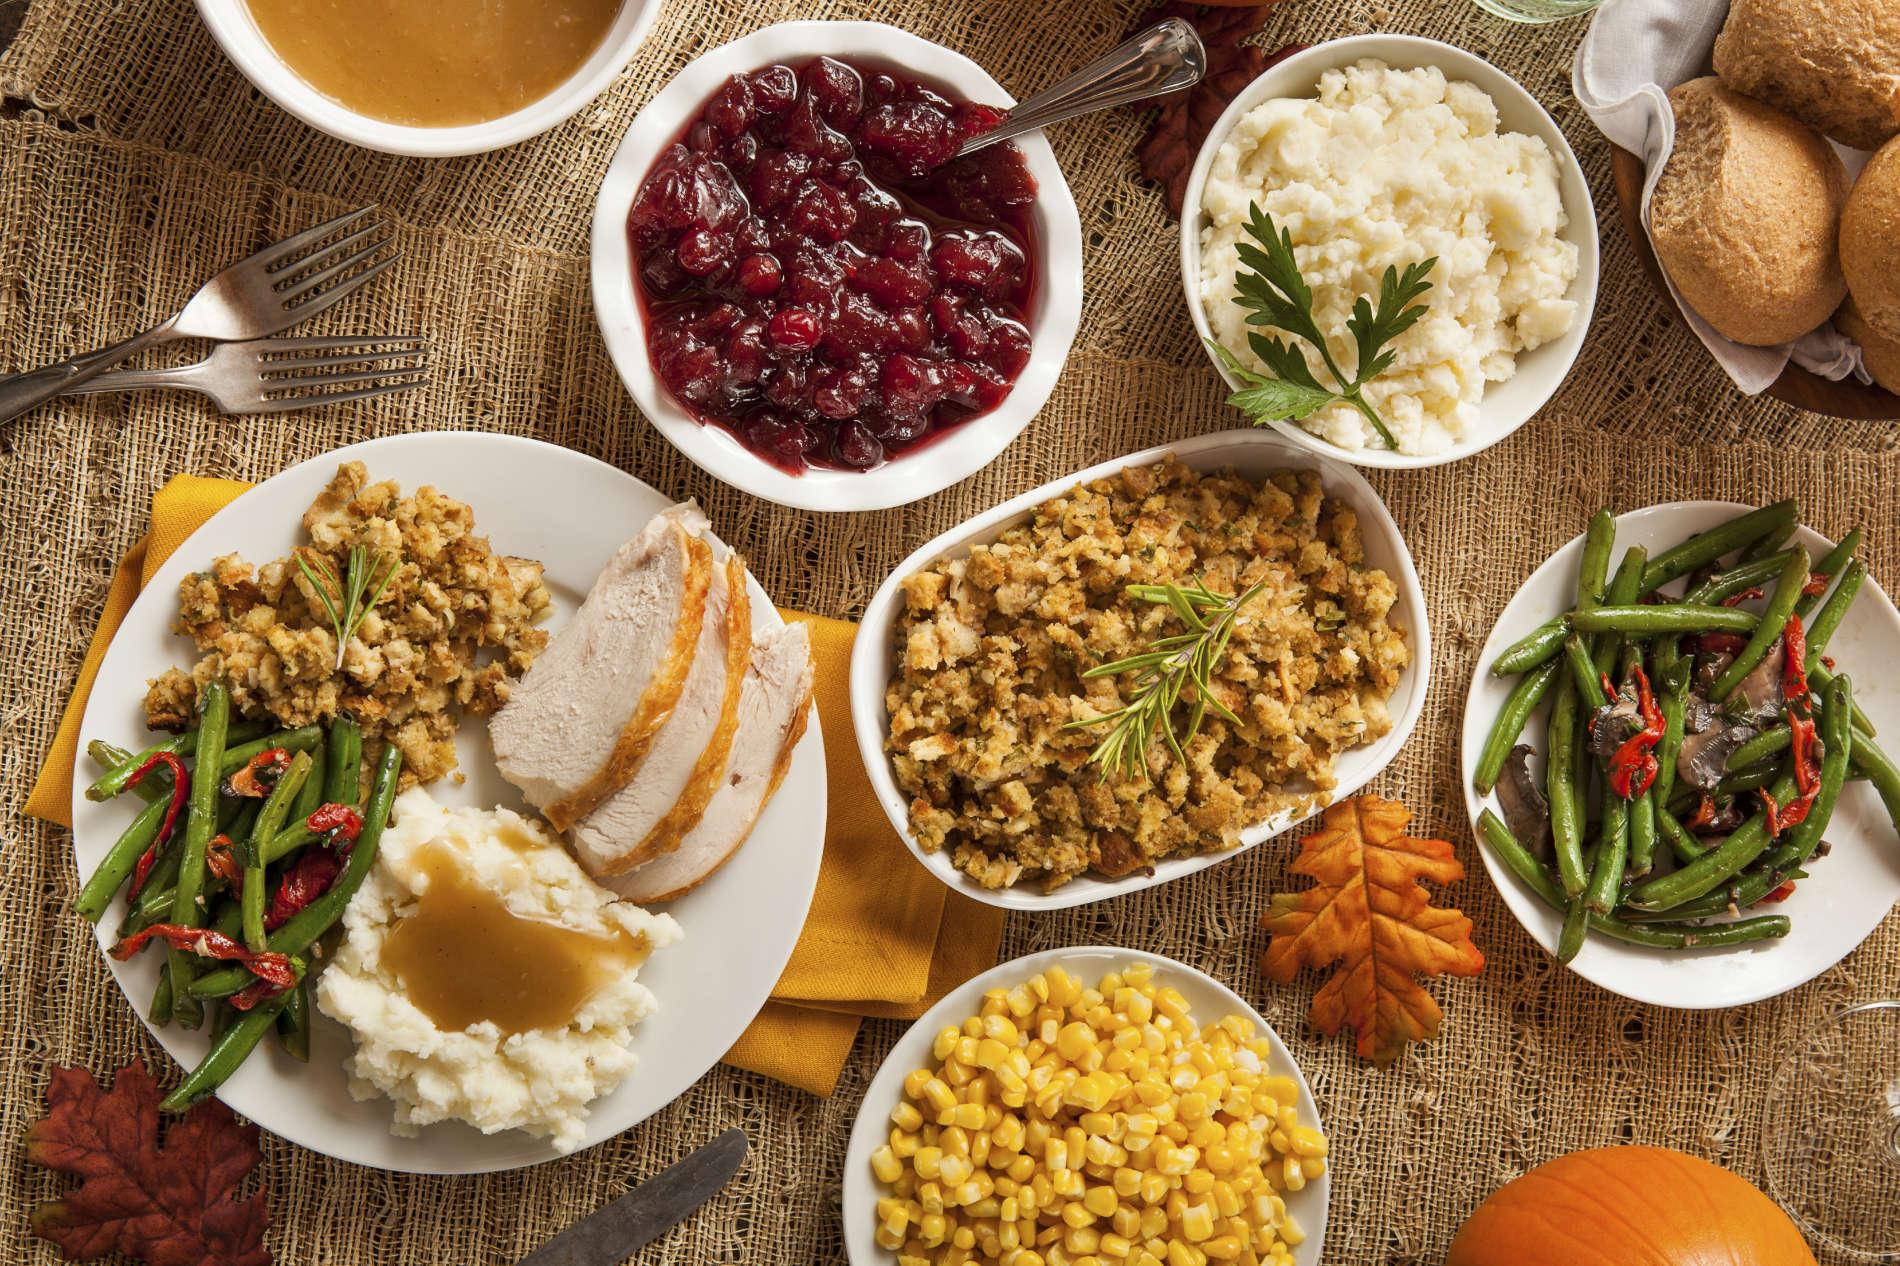 Homemade Turkey Thanksgiving Dinner ... & Organizing Yourself for Thanksgiving - Arizona News